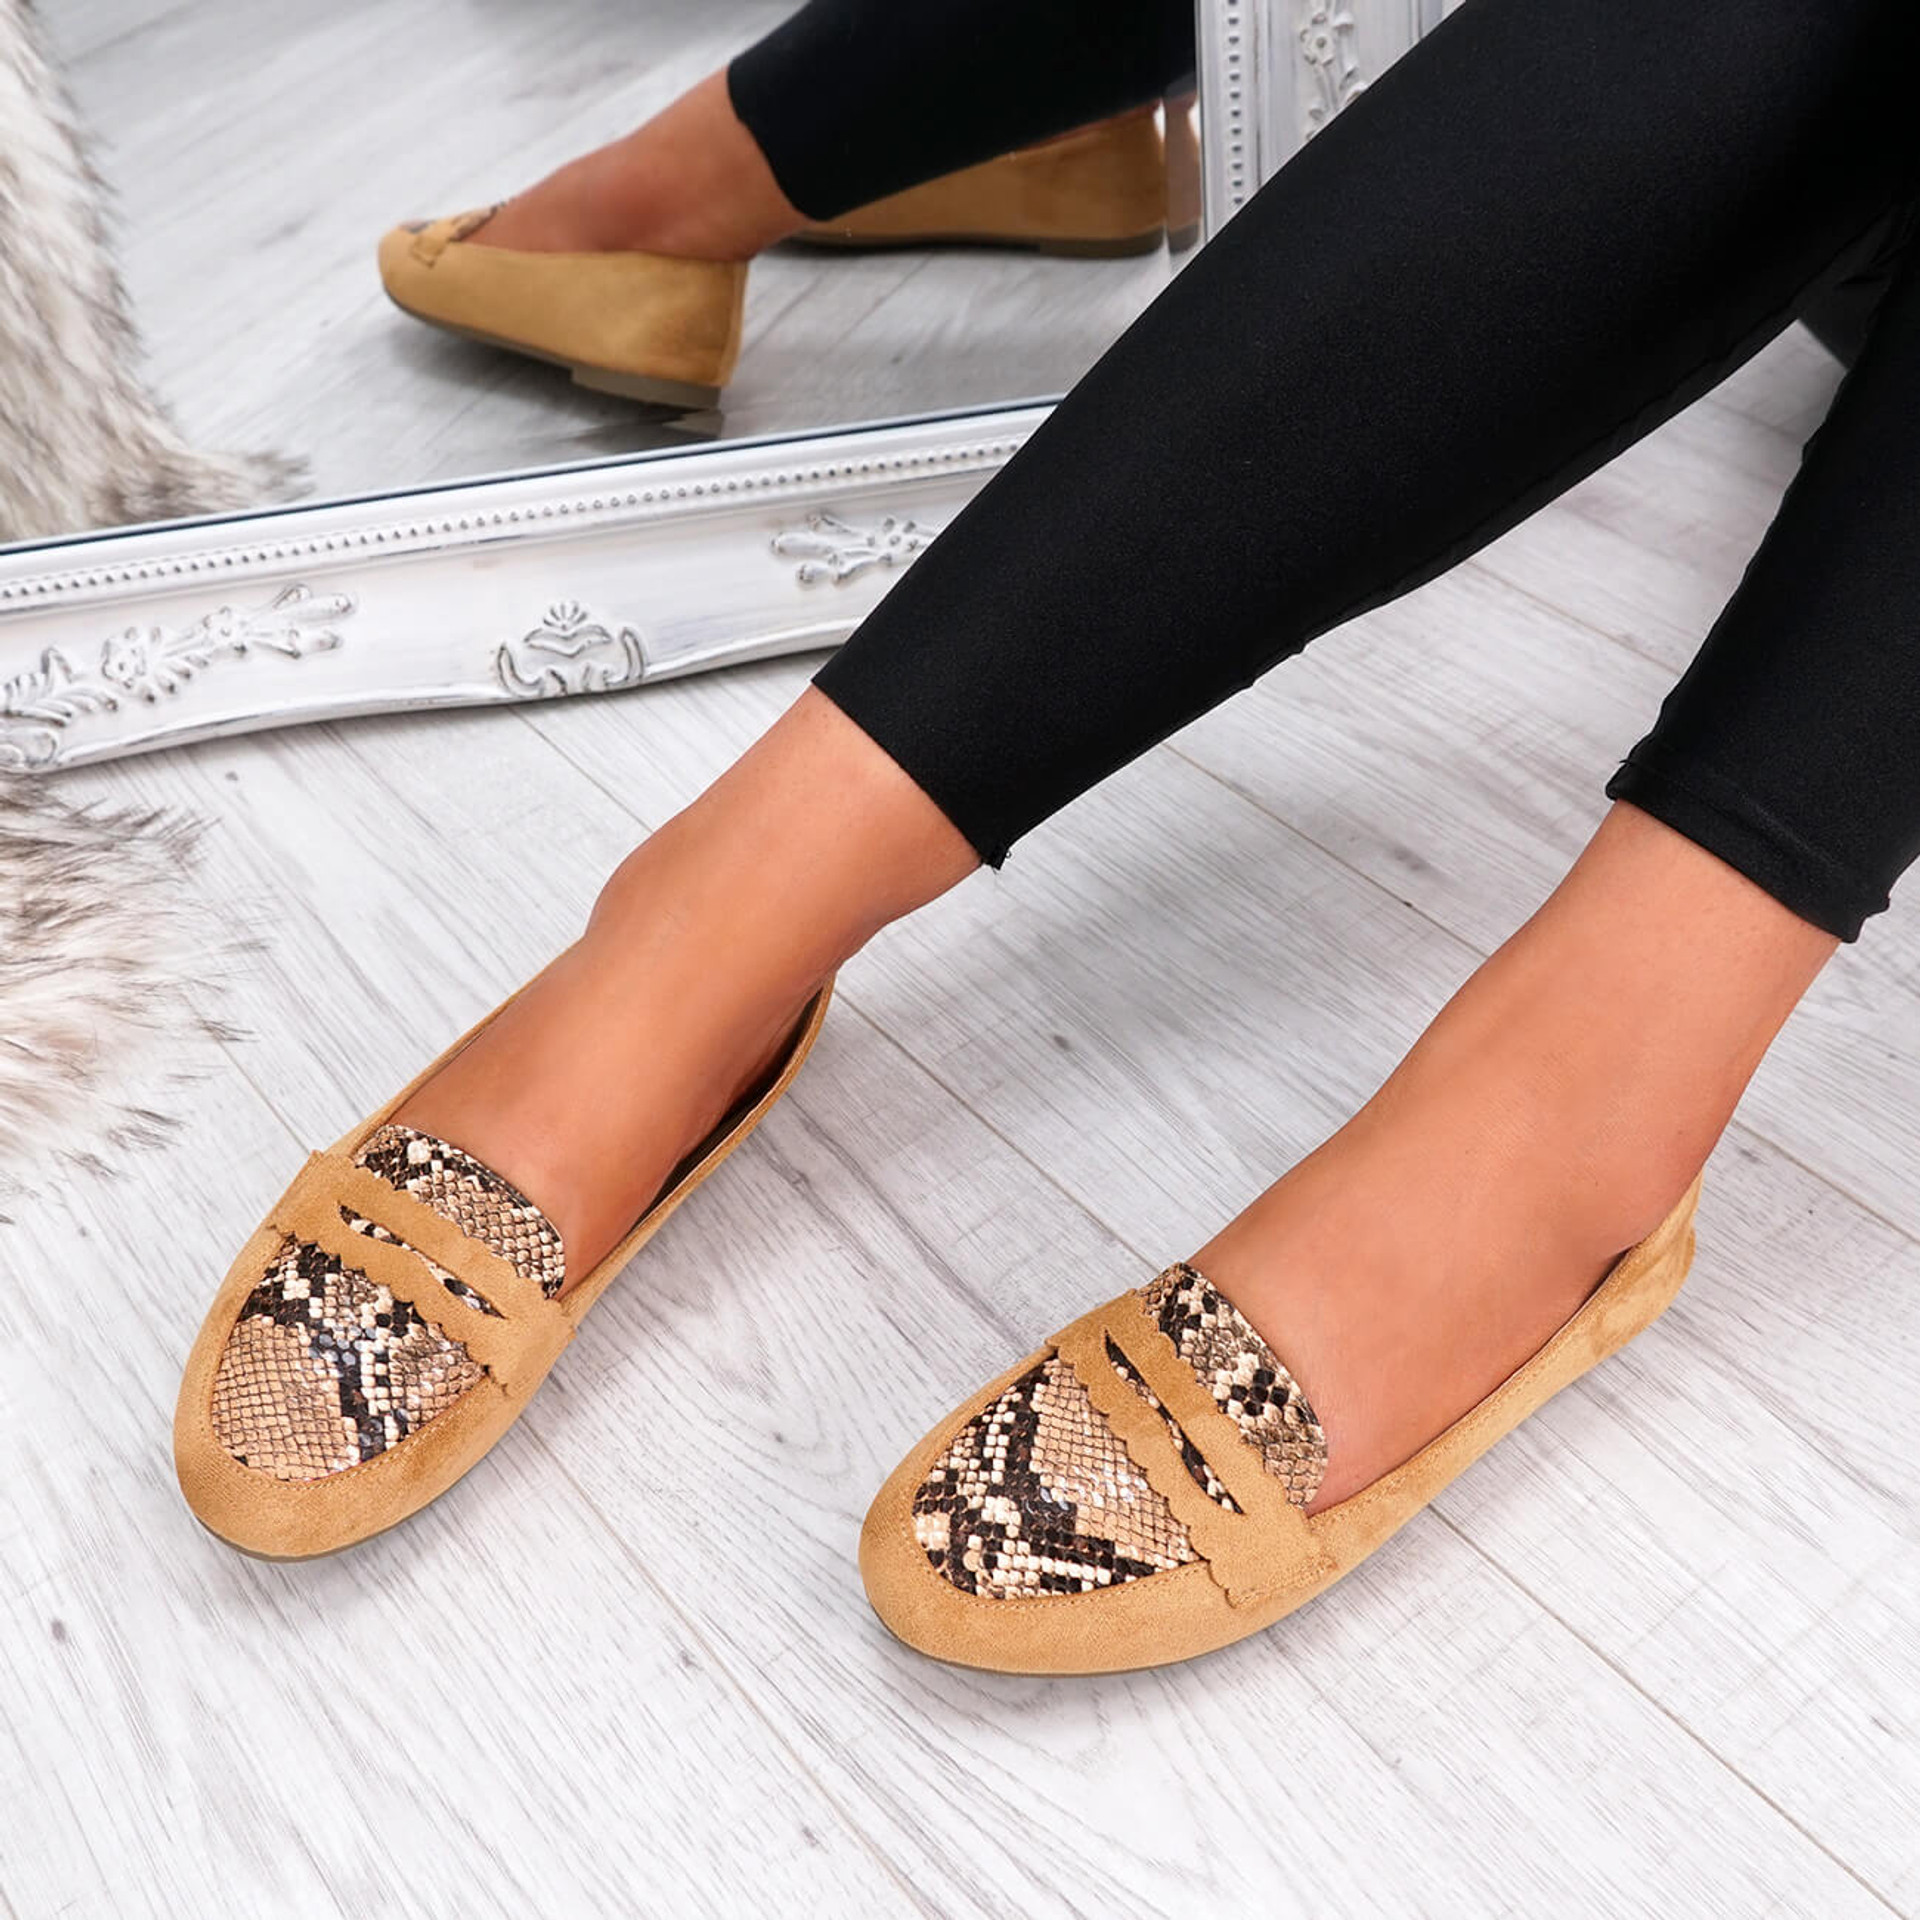 womens camel color slip on snake animal pattern ballerinas size uk 3 4 5 6 7 8